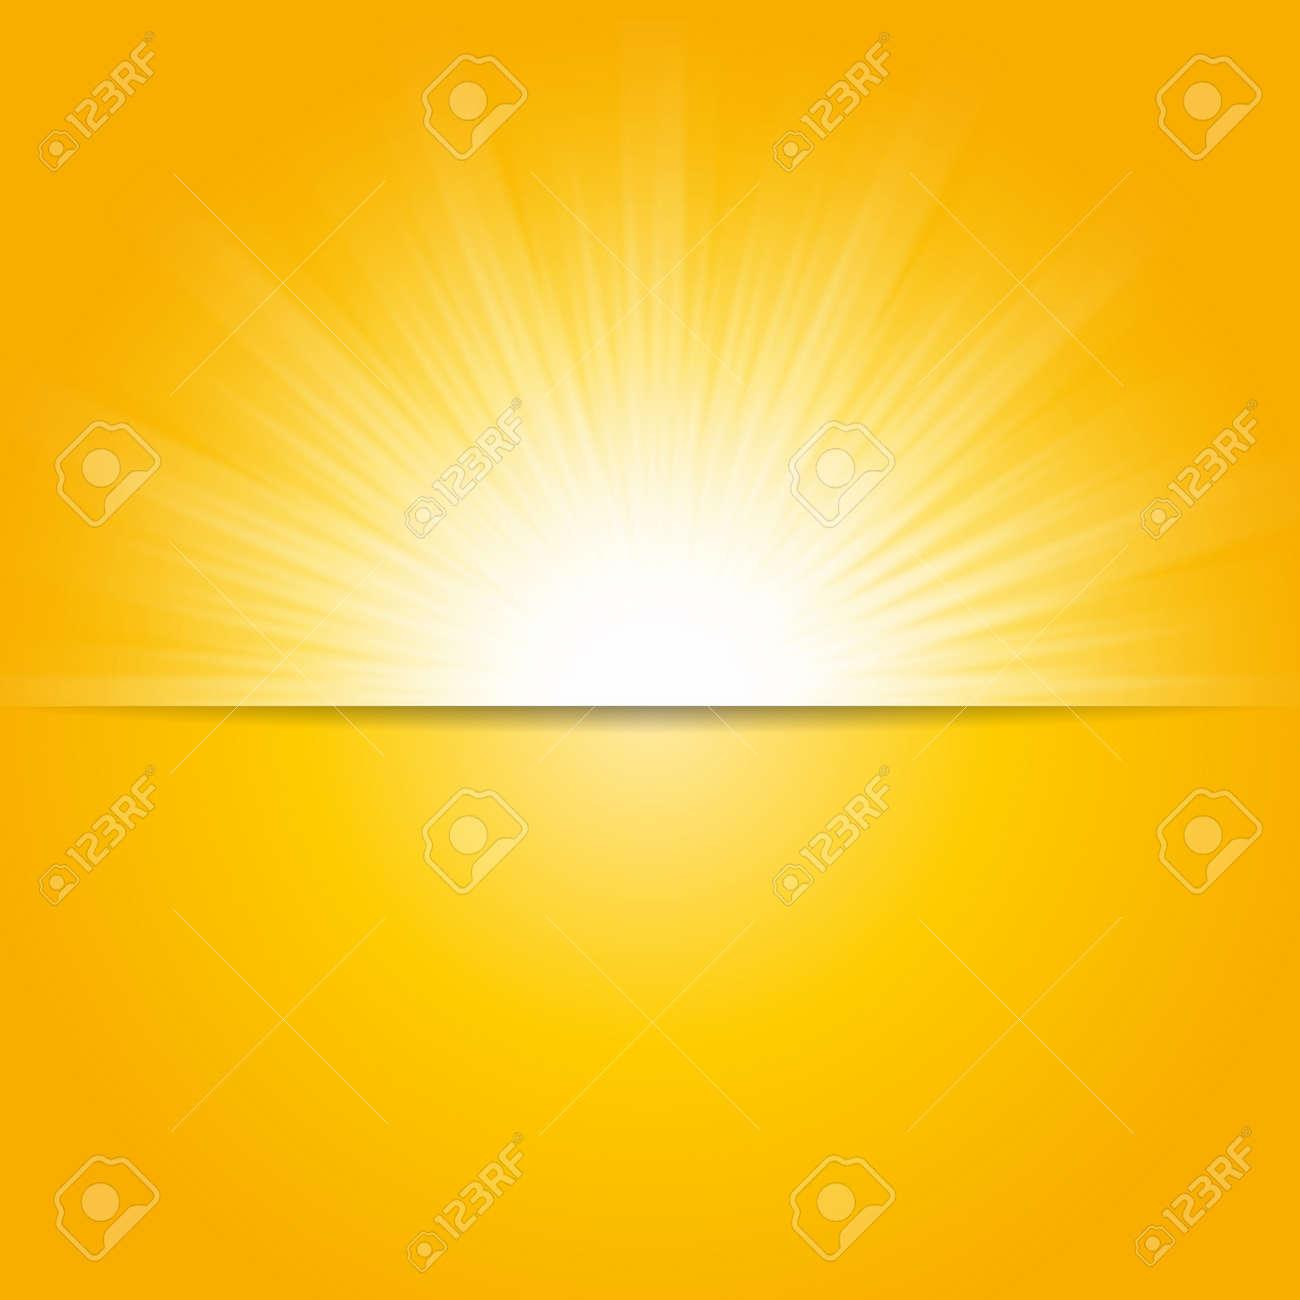 Shiny sun vector, sunbeams, sunrays background, banner design - 55416011